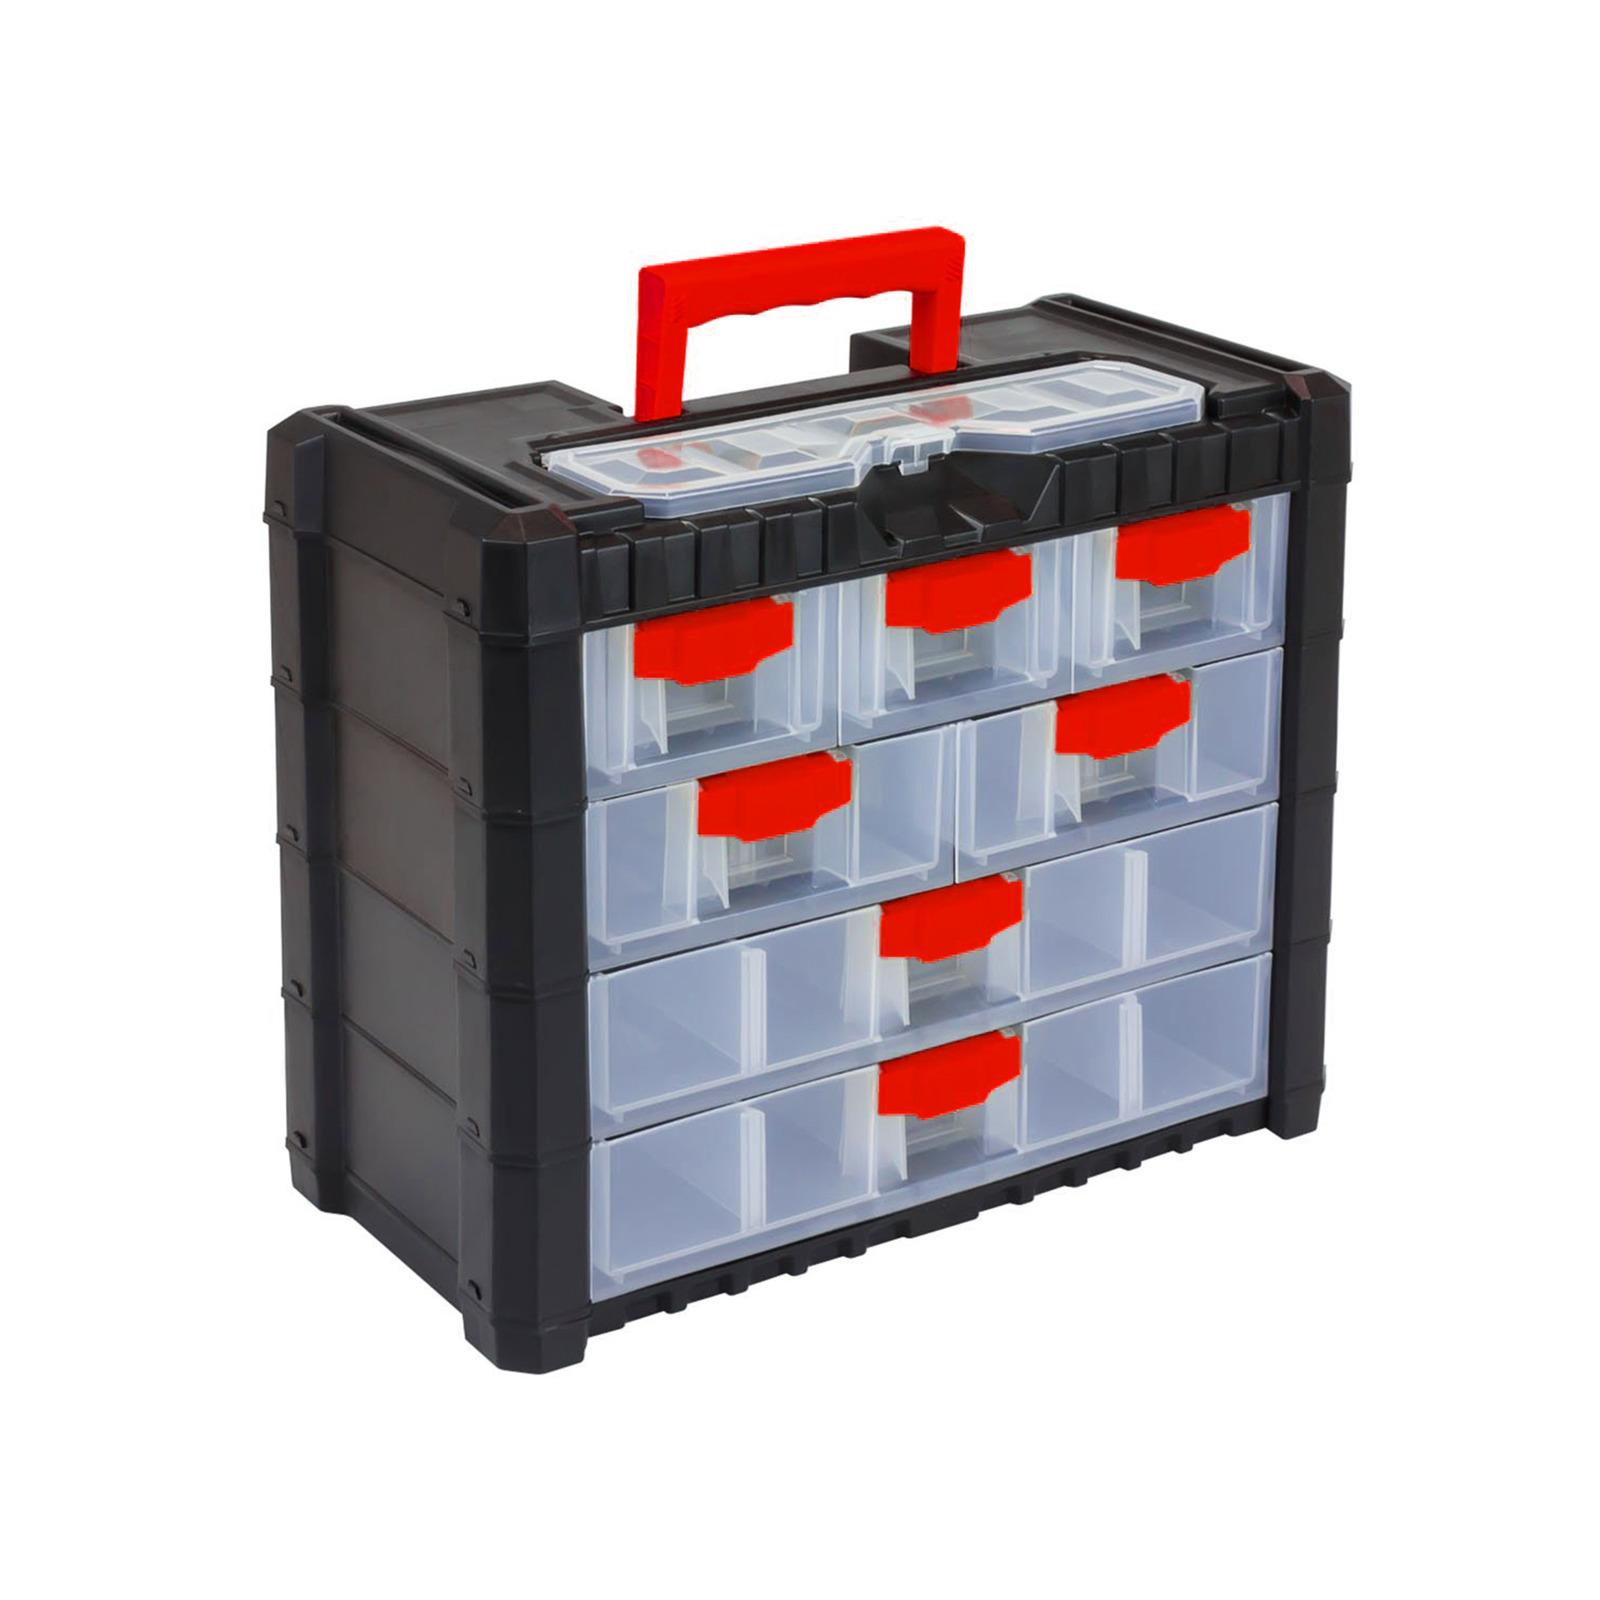 Prosperplast Multicase Cargo Tool Box 13